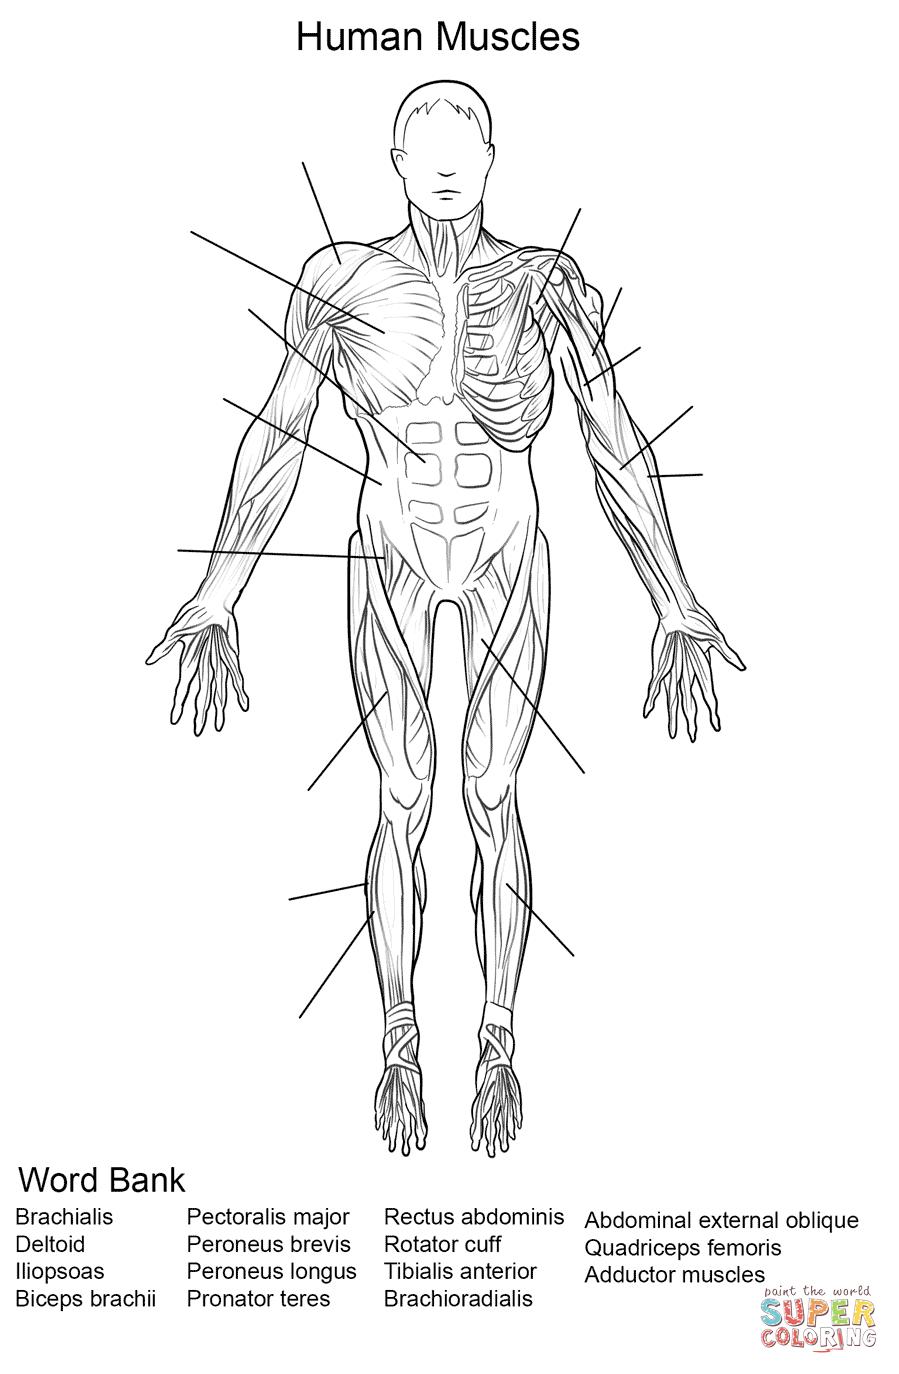 Human Muscles Front View Worksheet Coloring Page | Free Printable | Free Printable Human Anatomy Worksheets